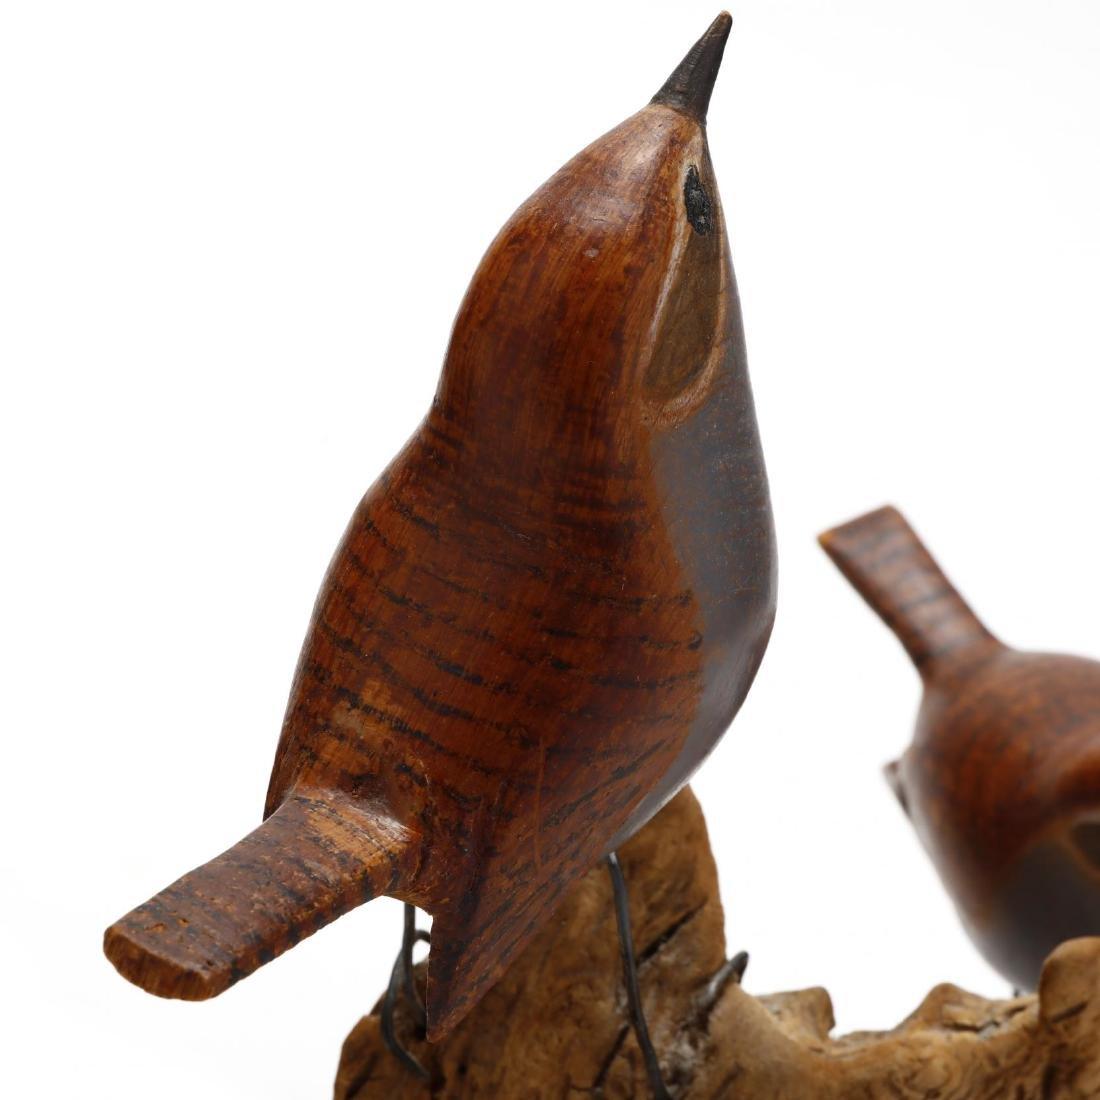 Two Folk Art Carvings, Alan Walker, VA Artist - 9